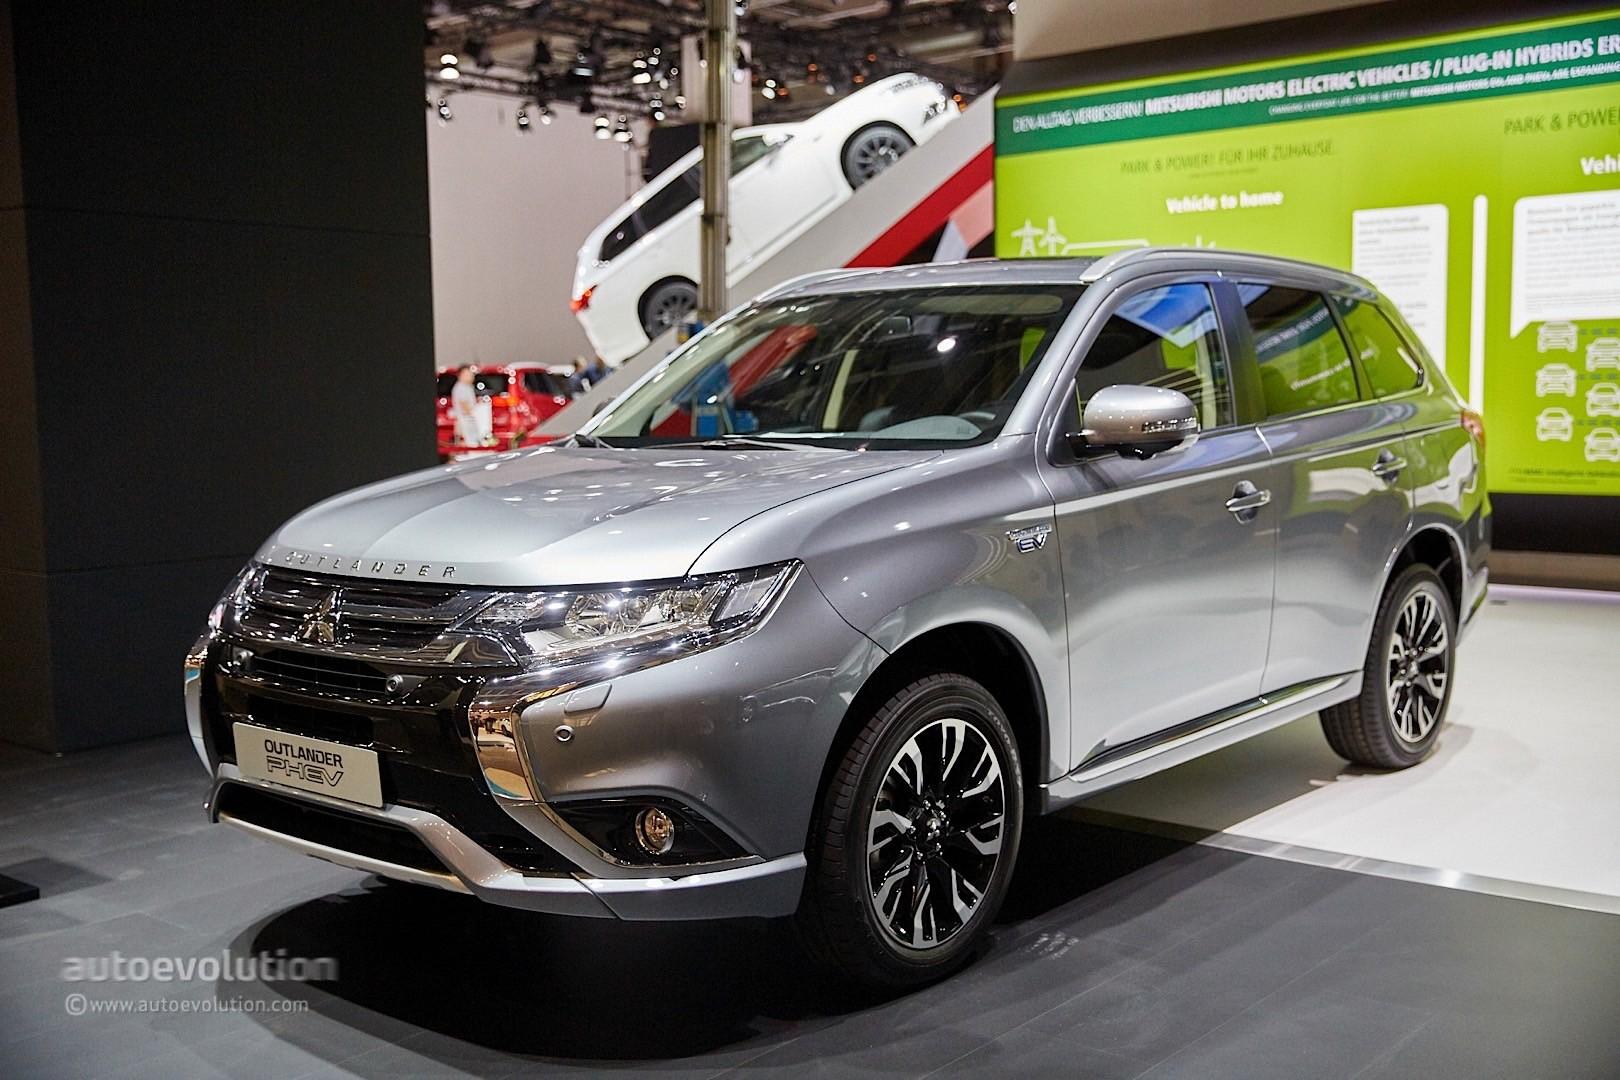 2015 Mitsubishi Outlander Sport >> Mitsubishi Outlander PHEV Facelift Revealed at Frankfurt, Gets Rally Version - autoevolution